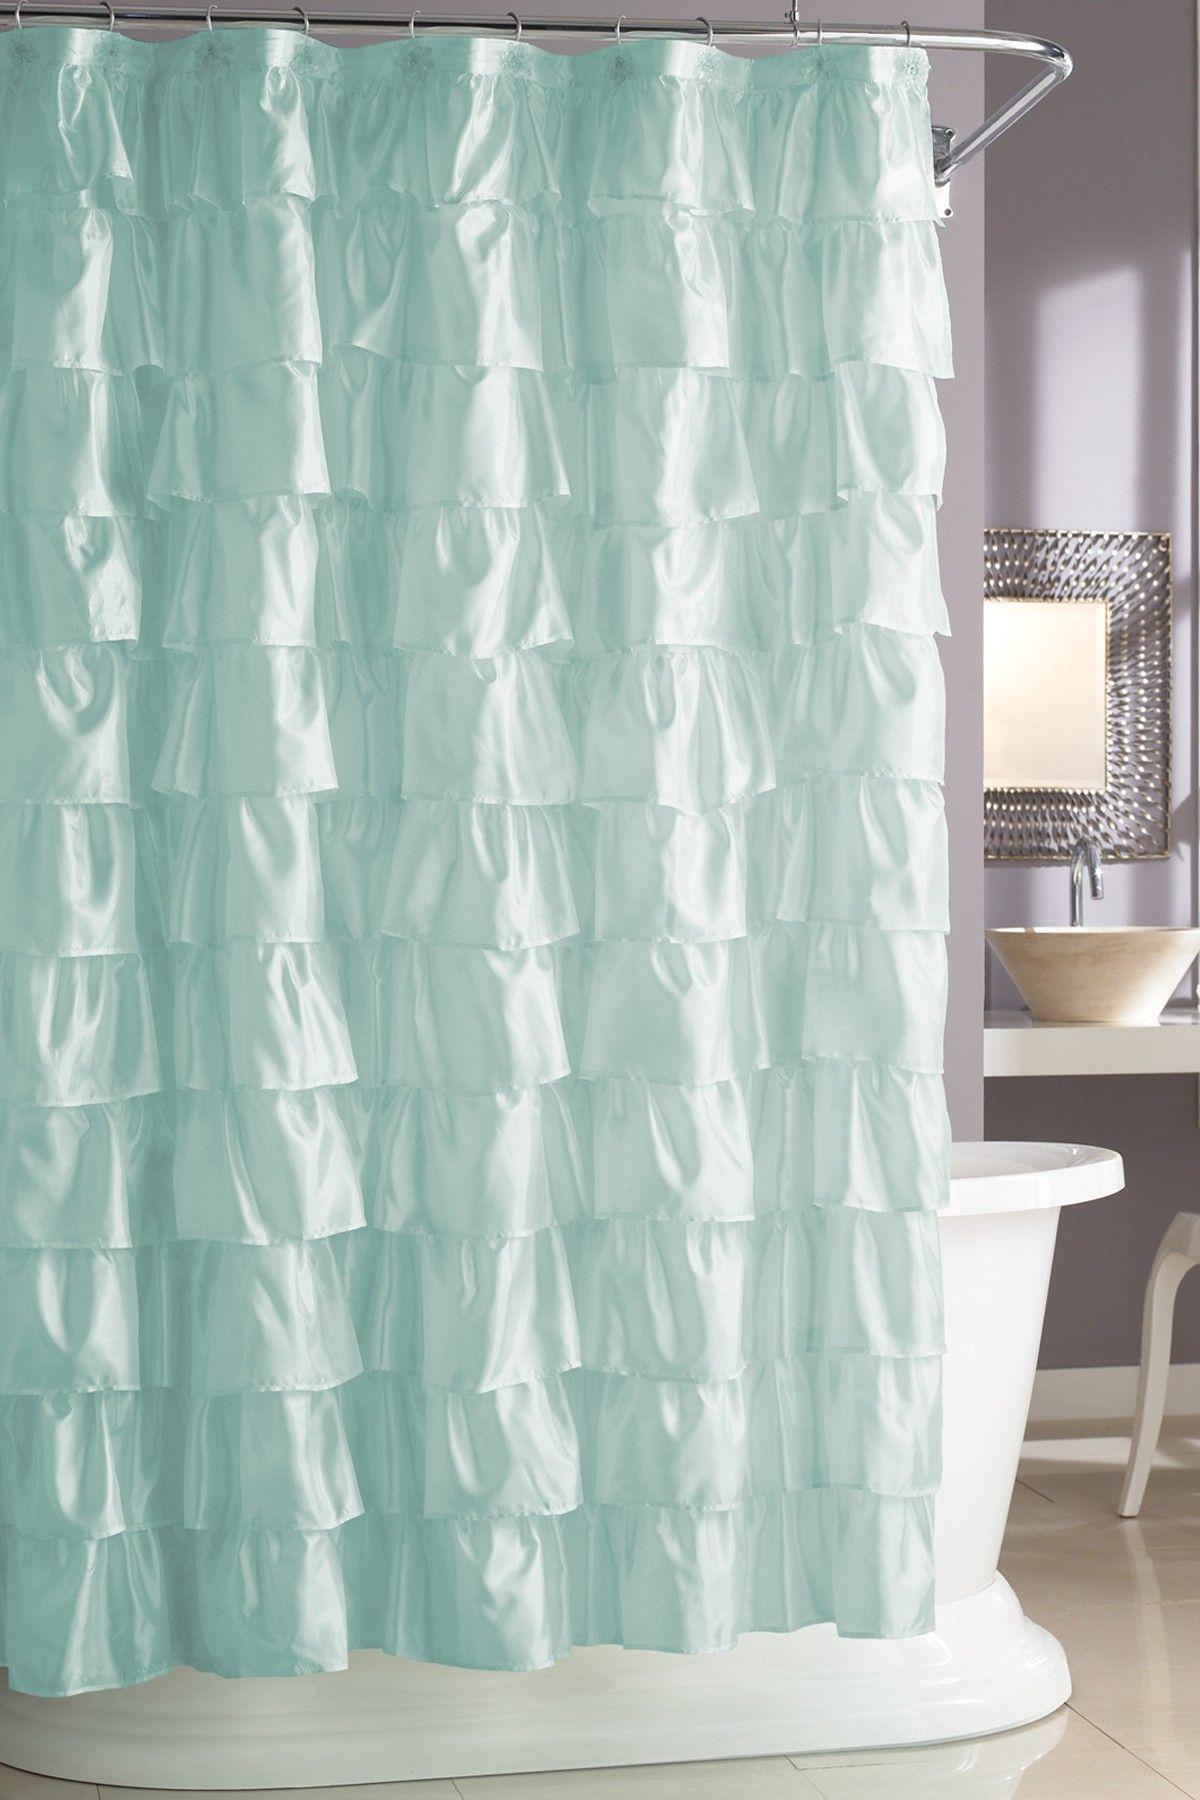 Steve Madden Ruffles Shower Curtain Mermaid Bathroom Mermaid Bathroom Decor Ruffle Shower Curtains